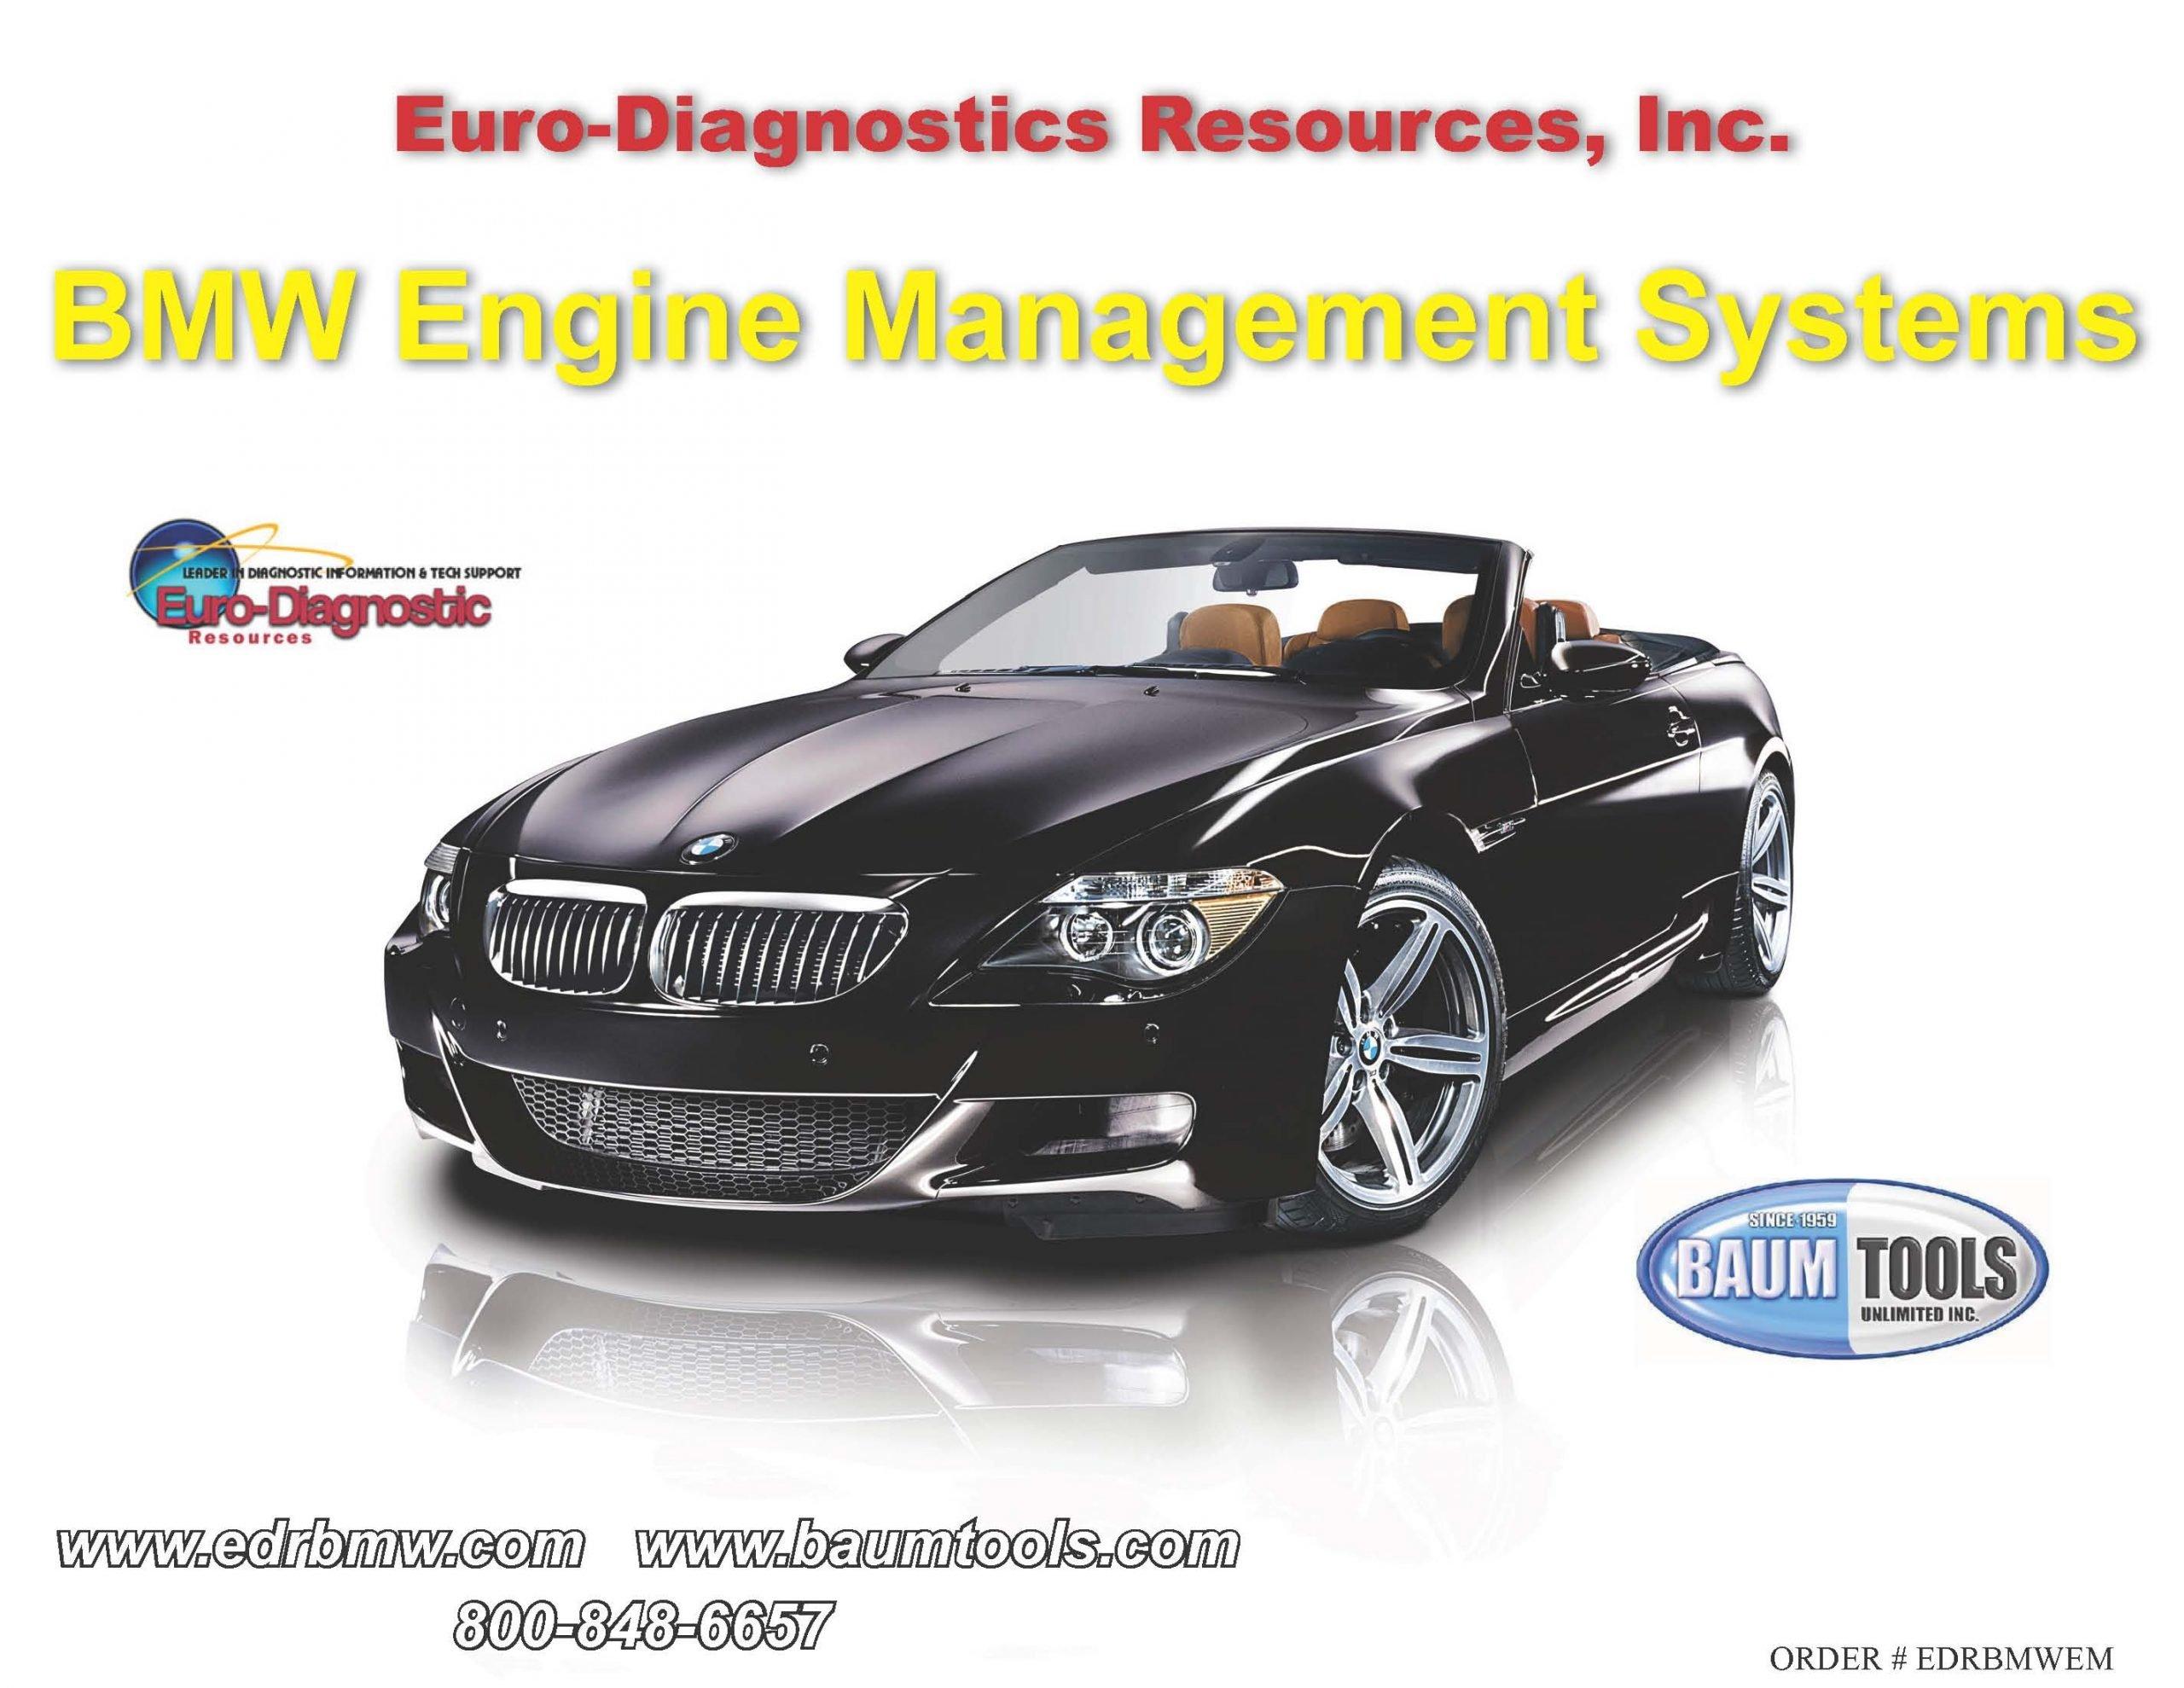 BMW Engine Management Systems